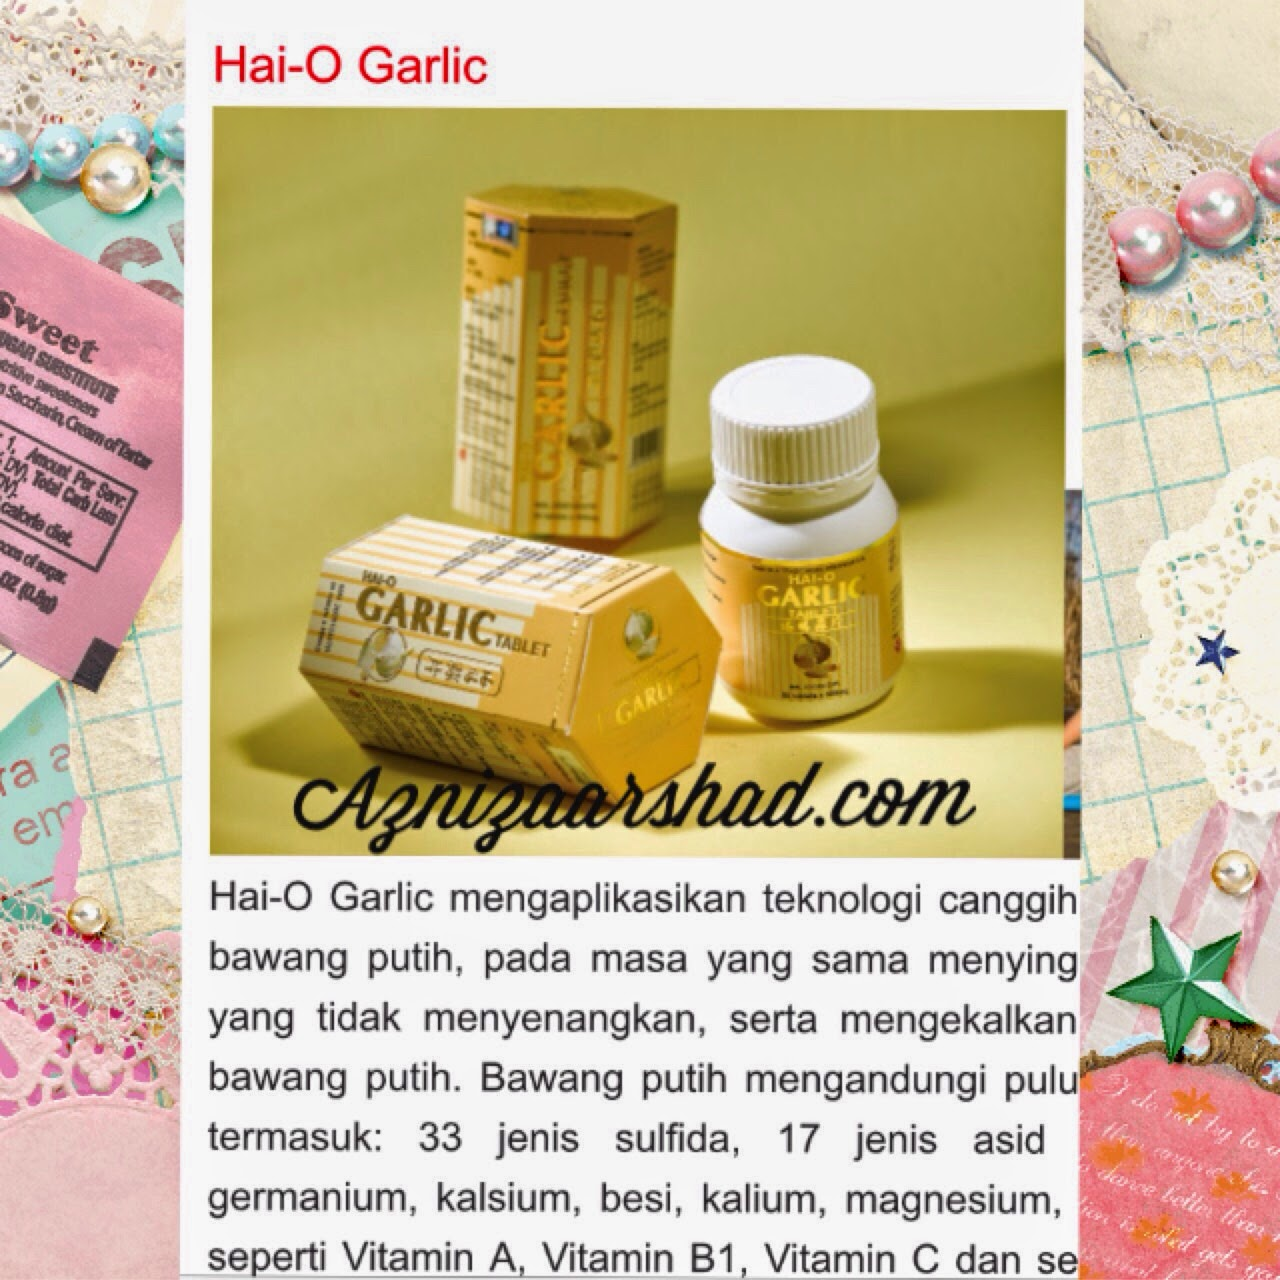 Hai-O garlic, garlic, awet muda, kurus, kurus semulajadi, aznizaarshad, hai-o